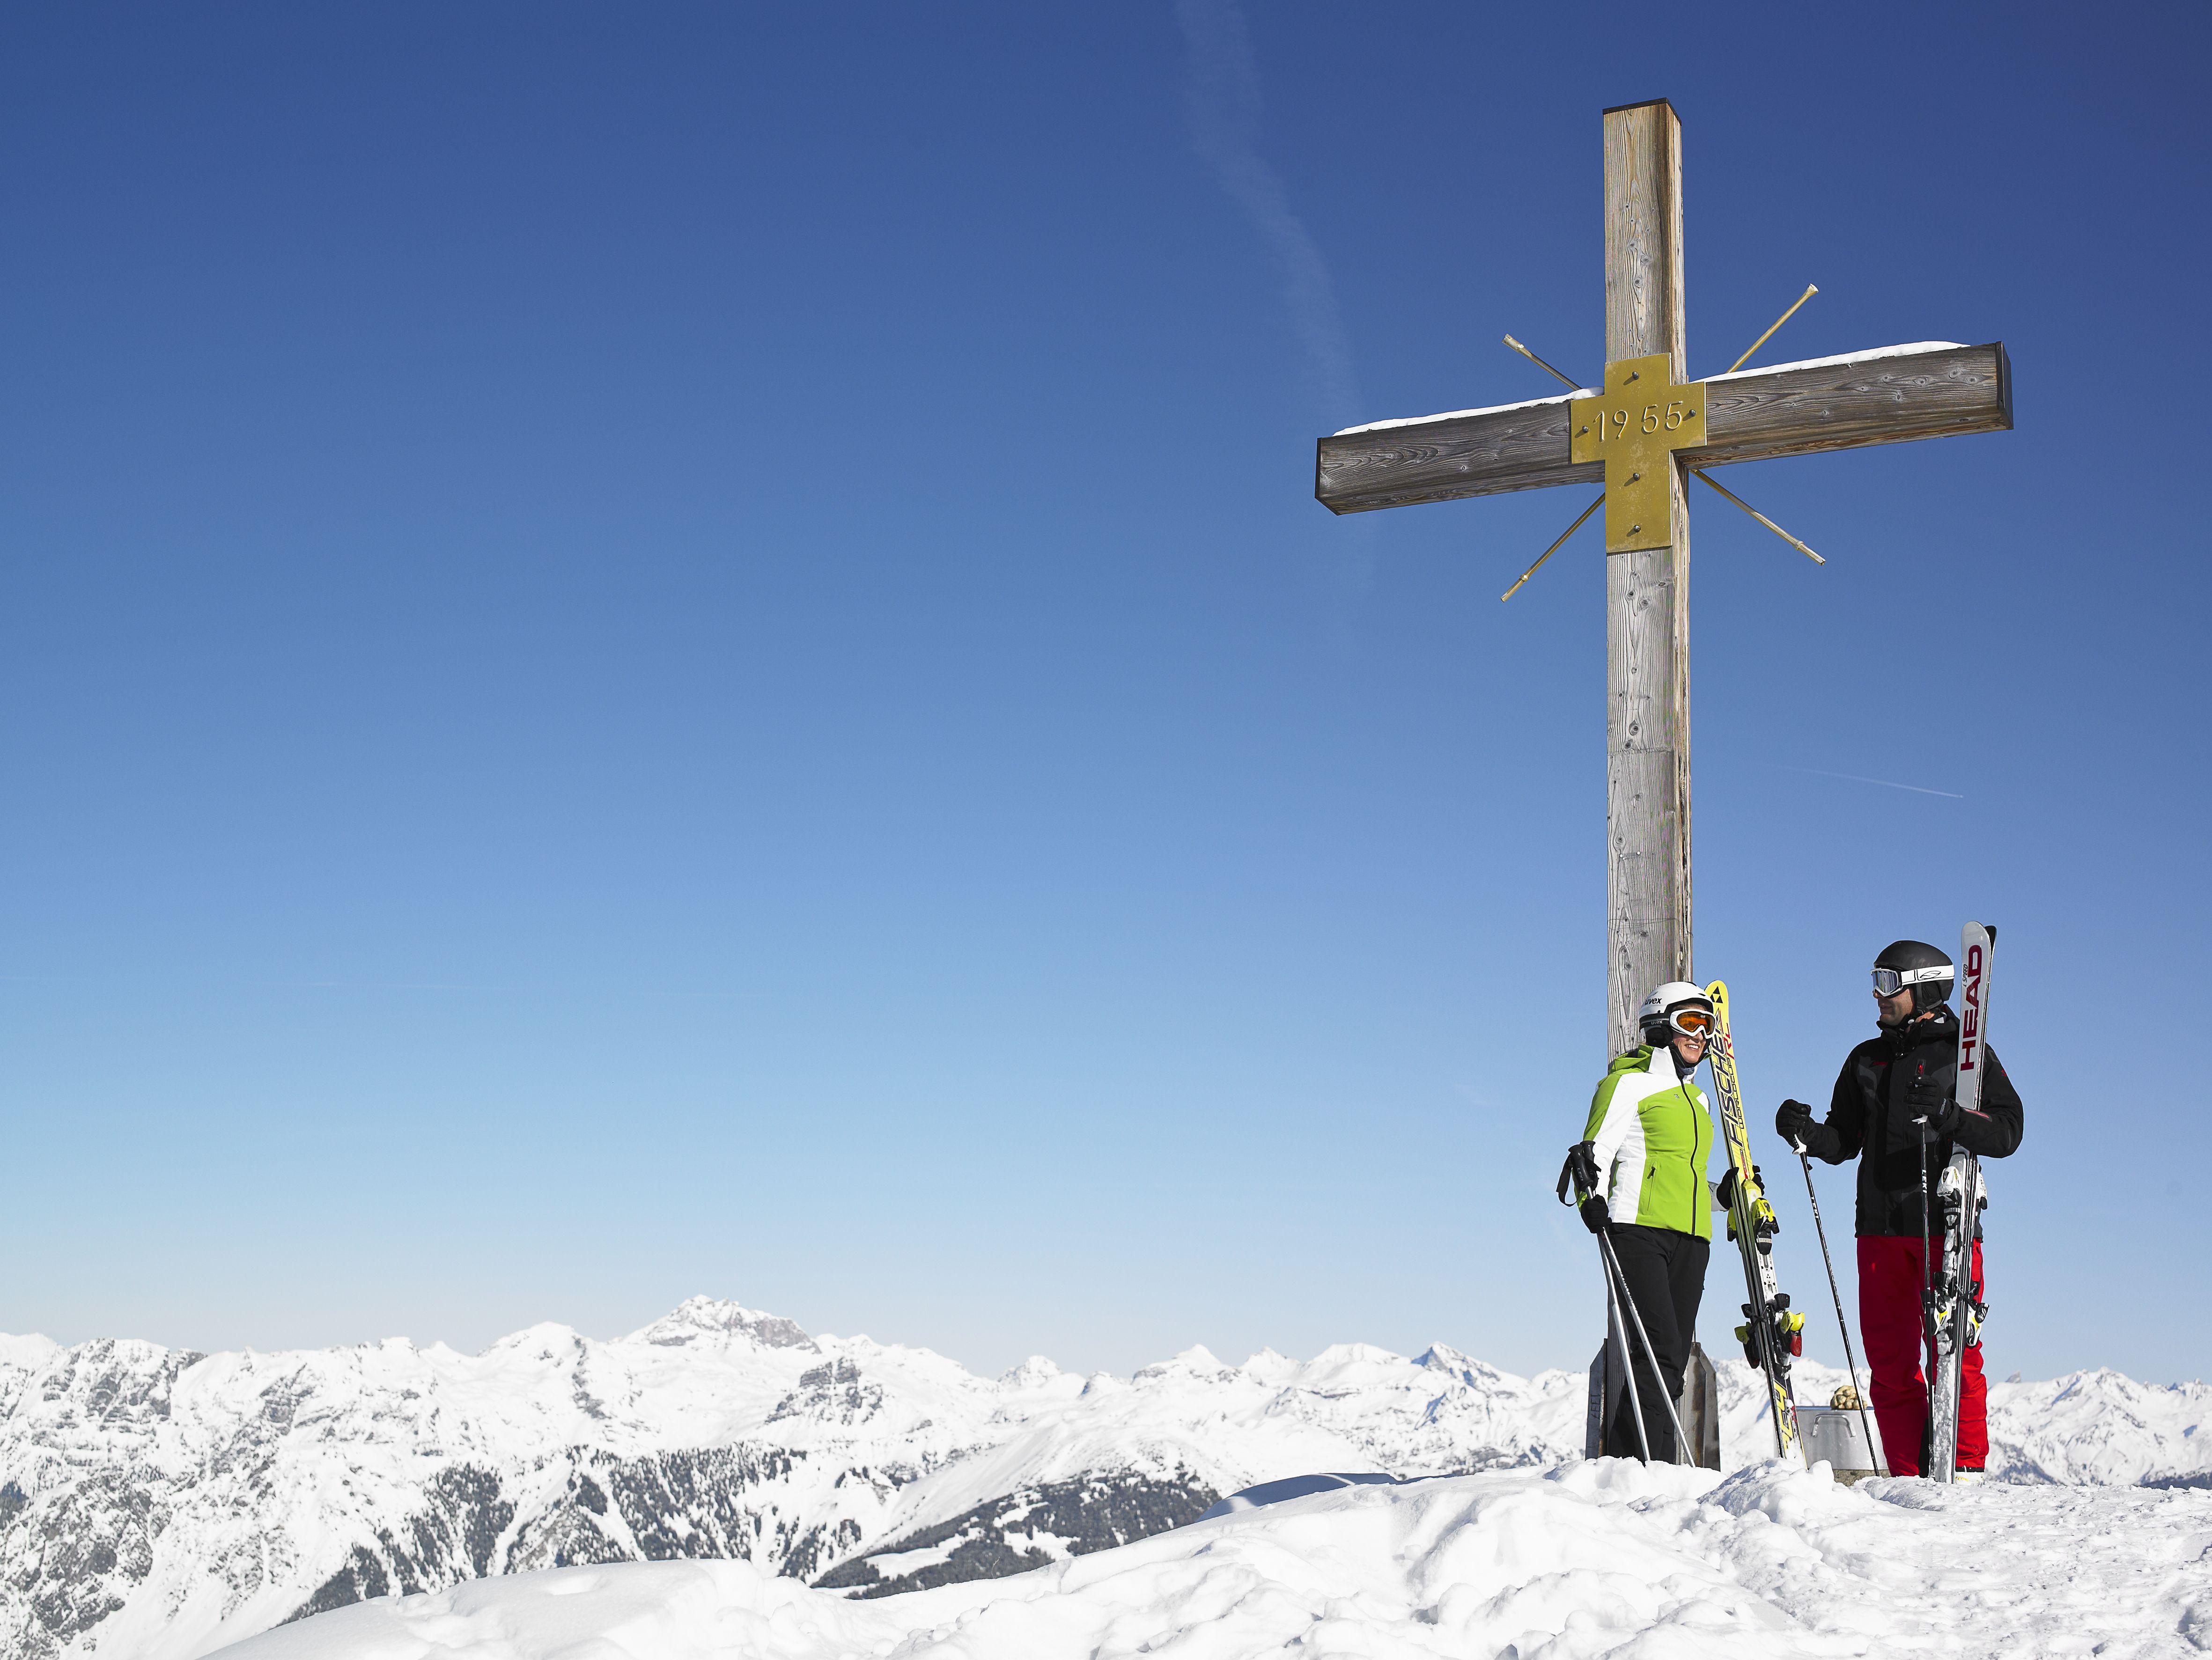 on the top of the mountain in montafon - auf dem Gipfel im Montafon